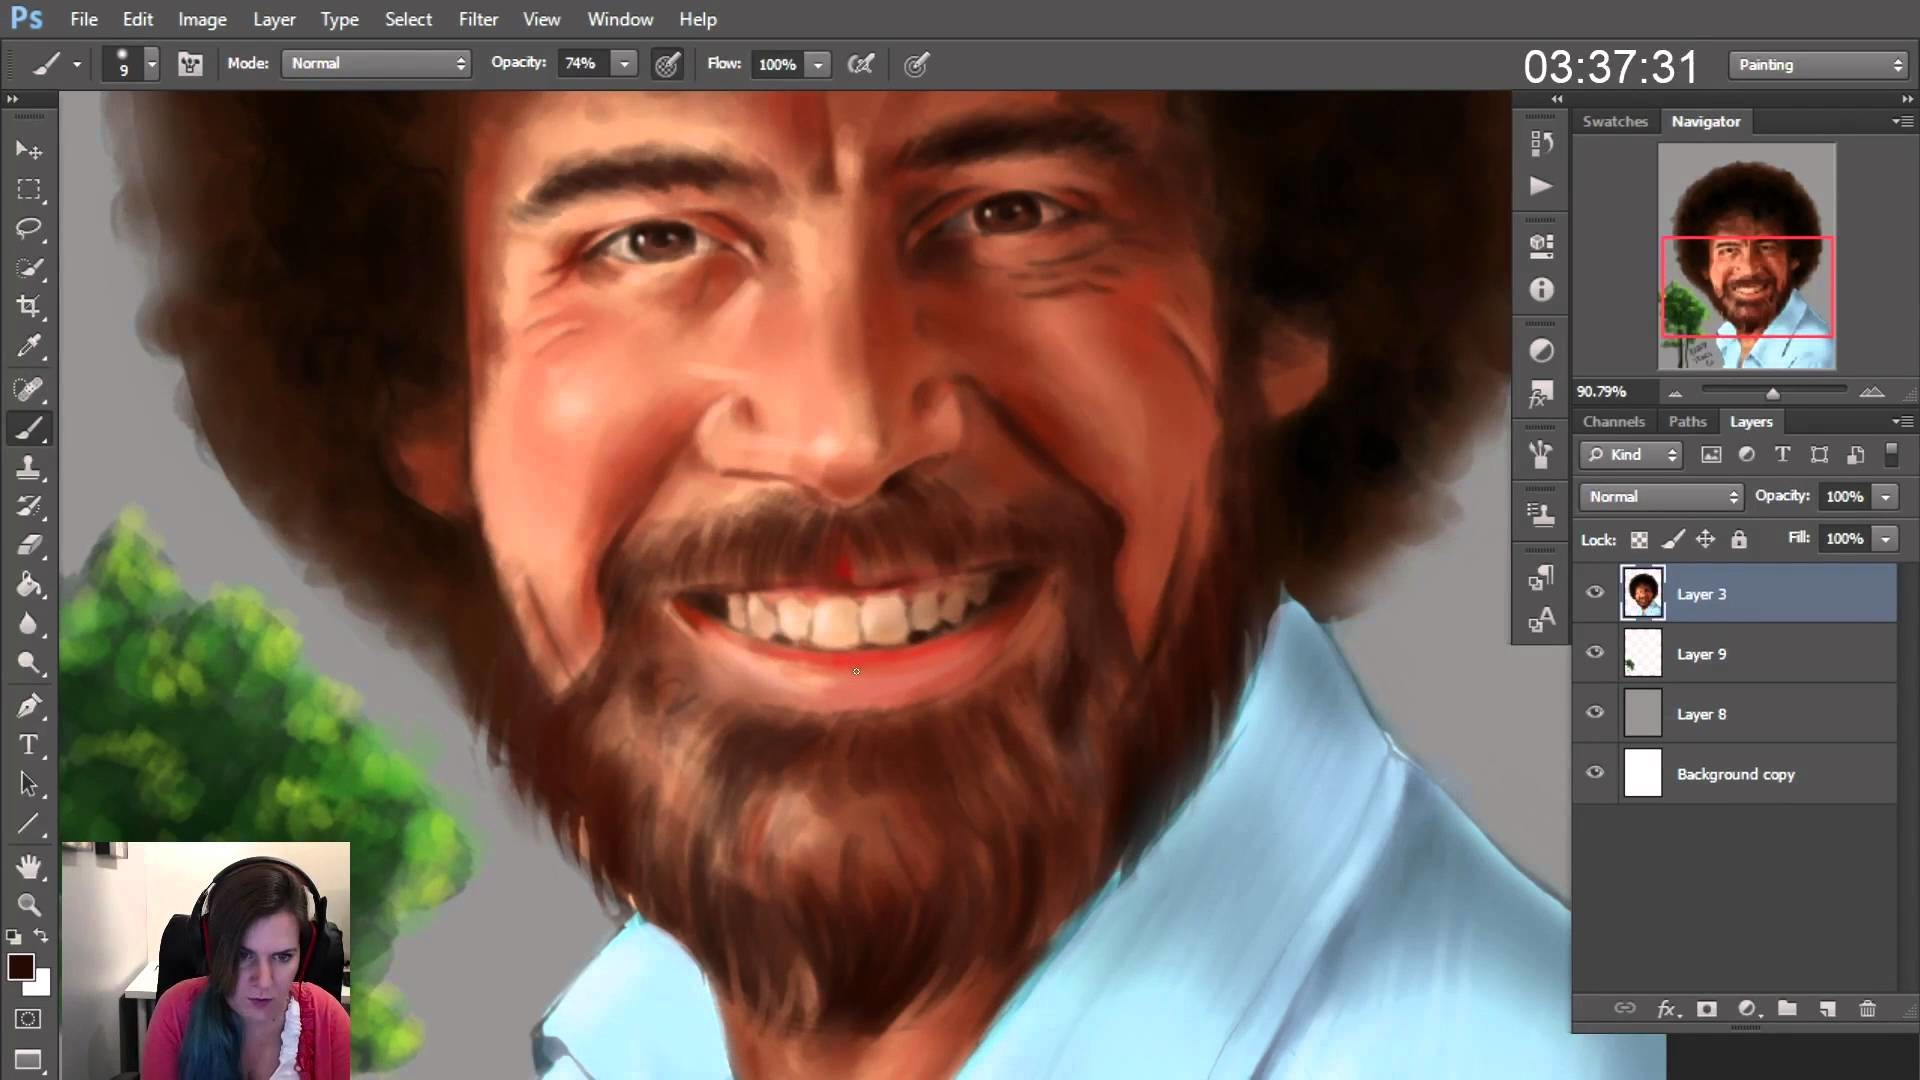 Bob Ross portrait painting